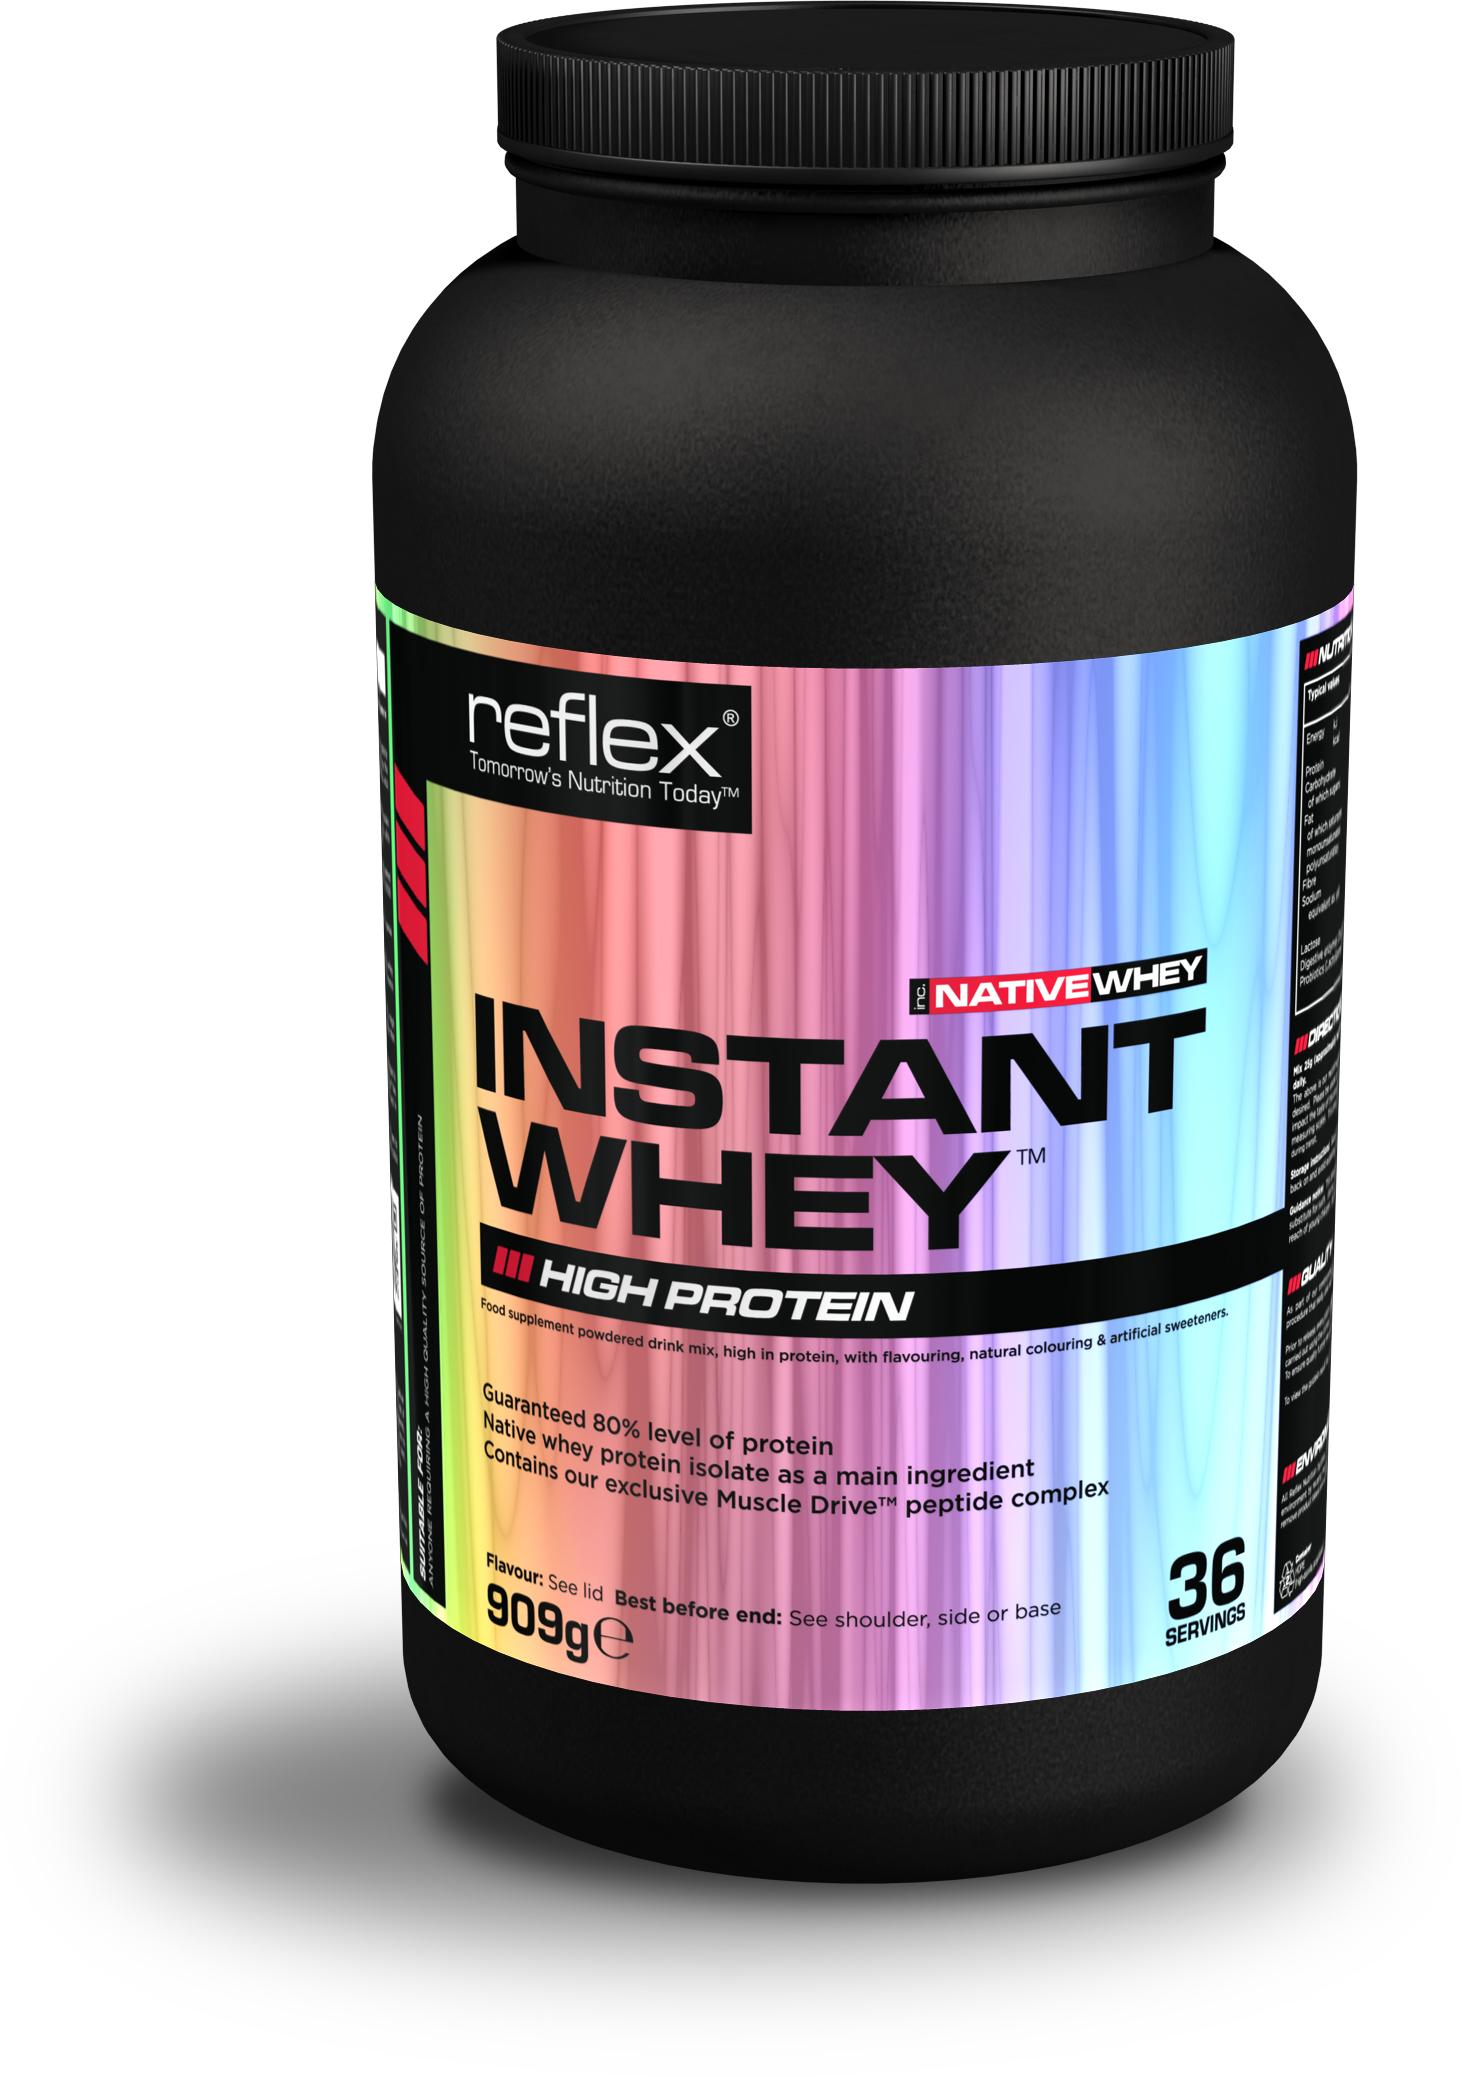 instant whey pro reflex